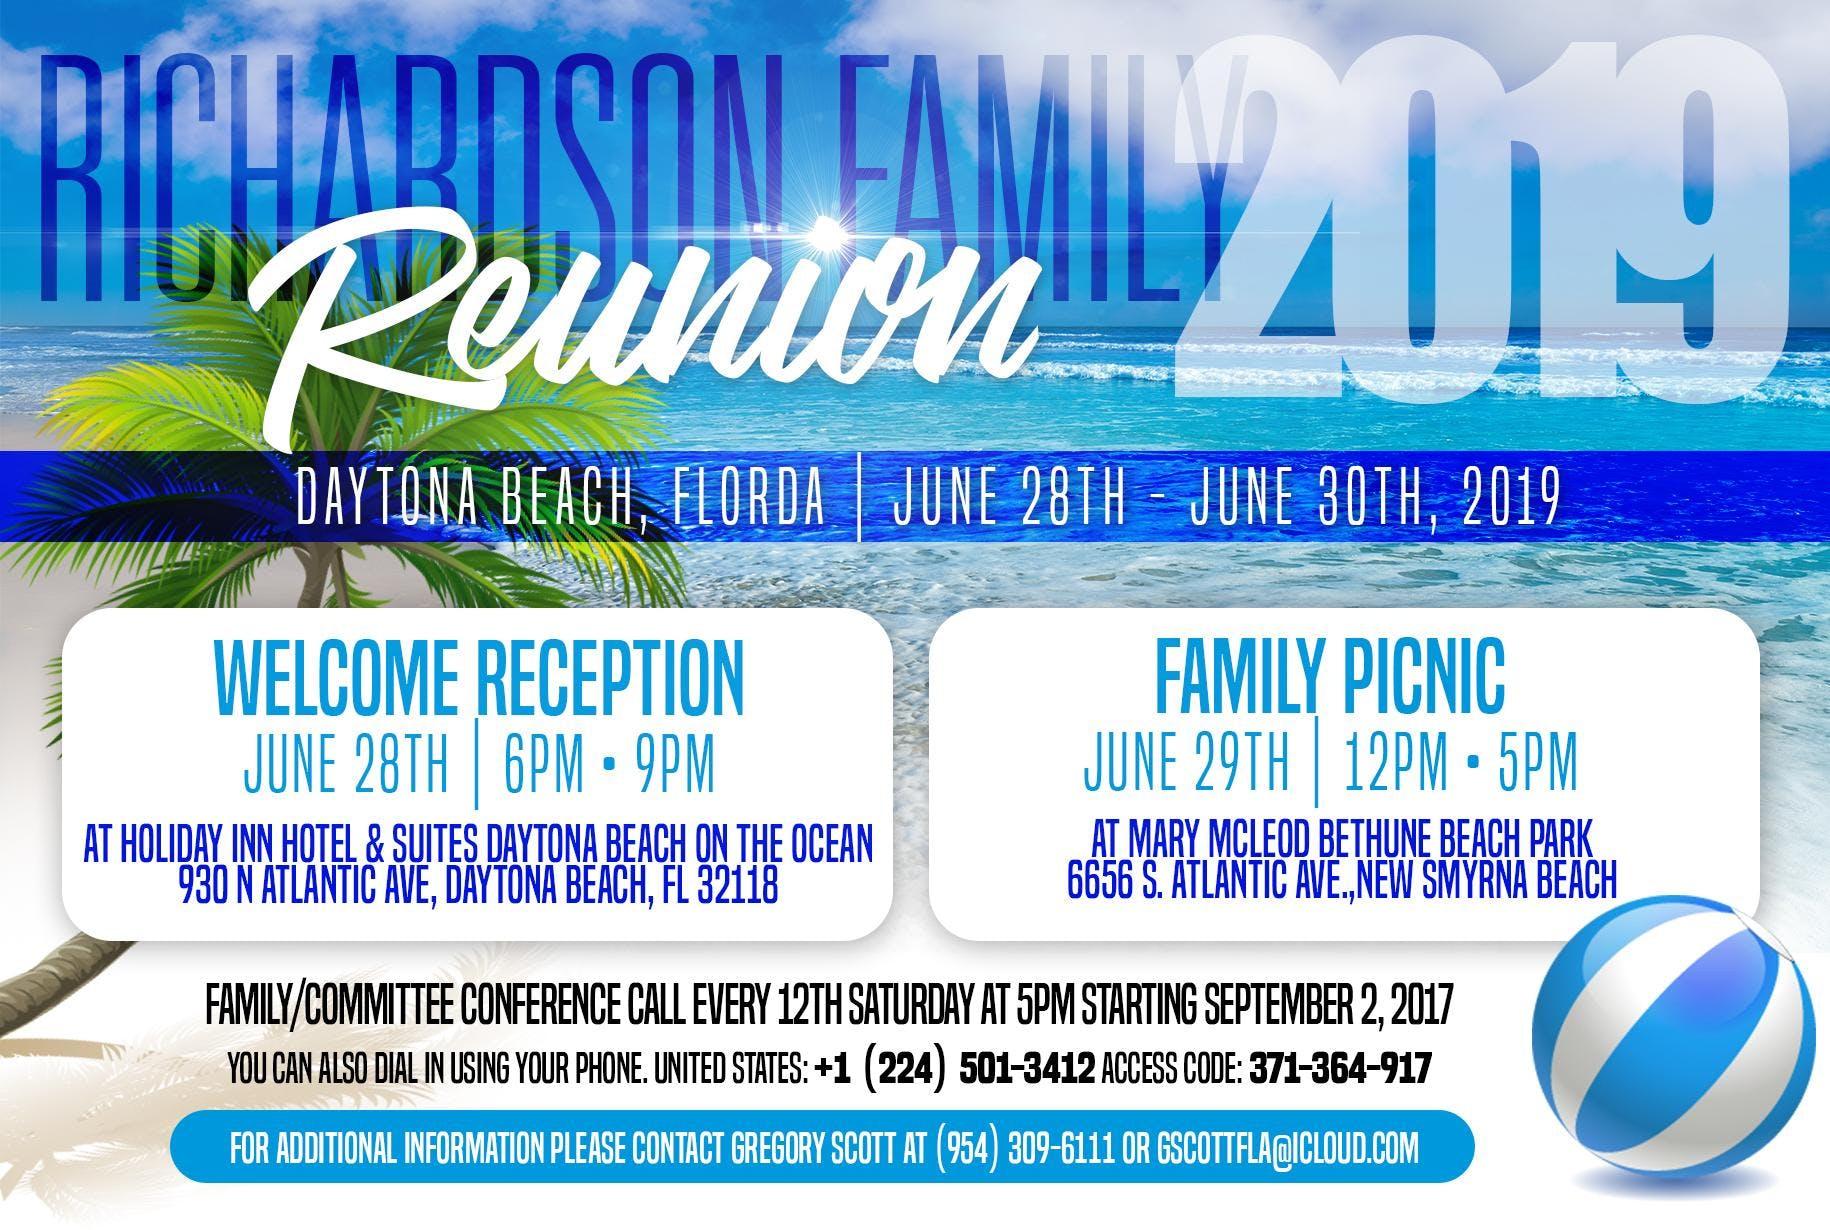 daytona events in New Smyrna Beach, Today and Upcoming